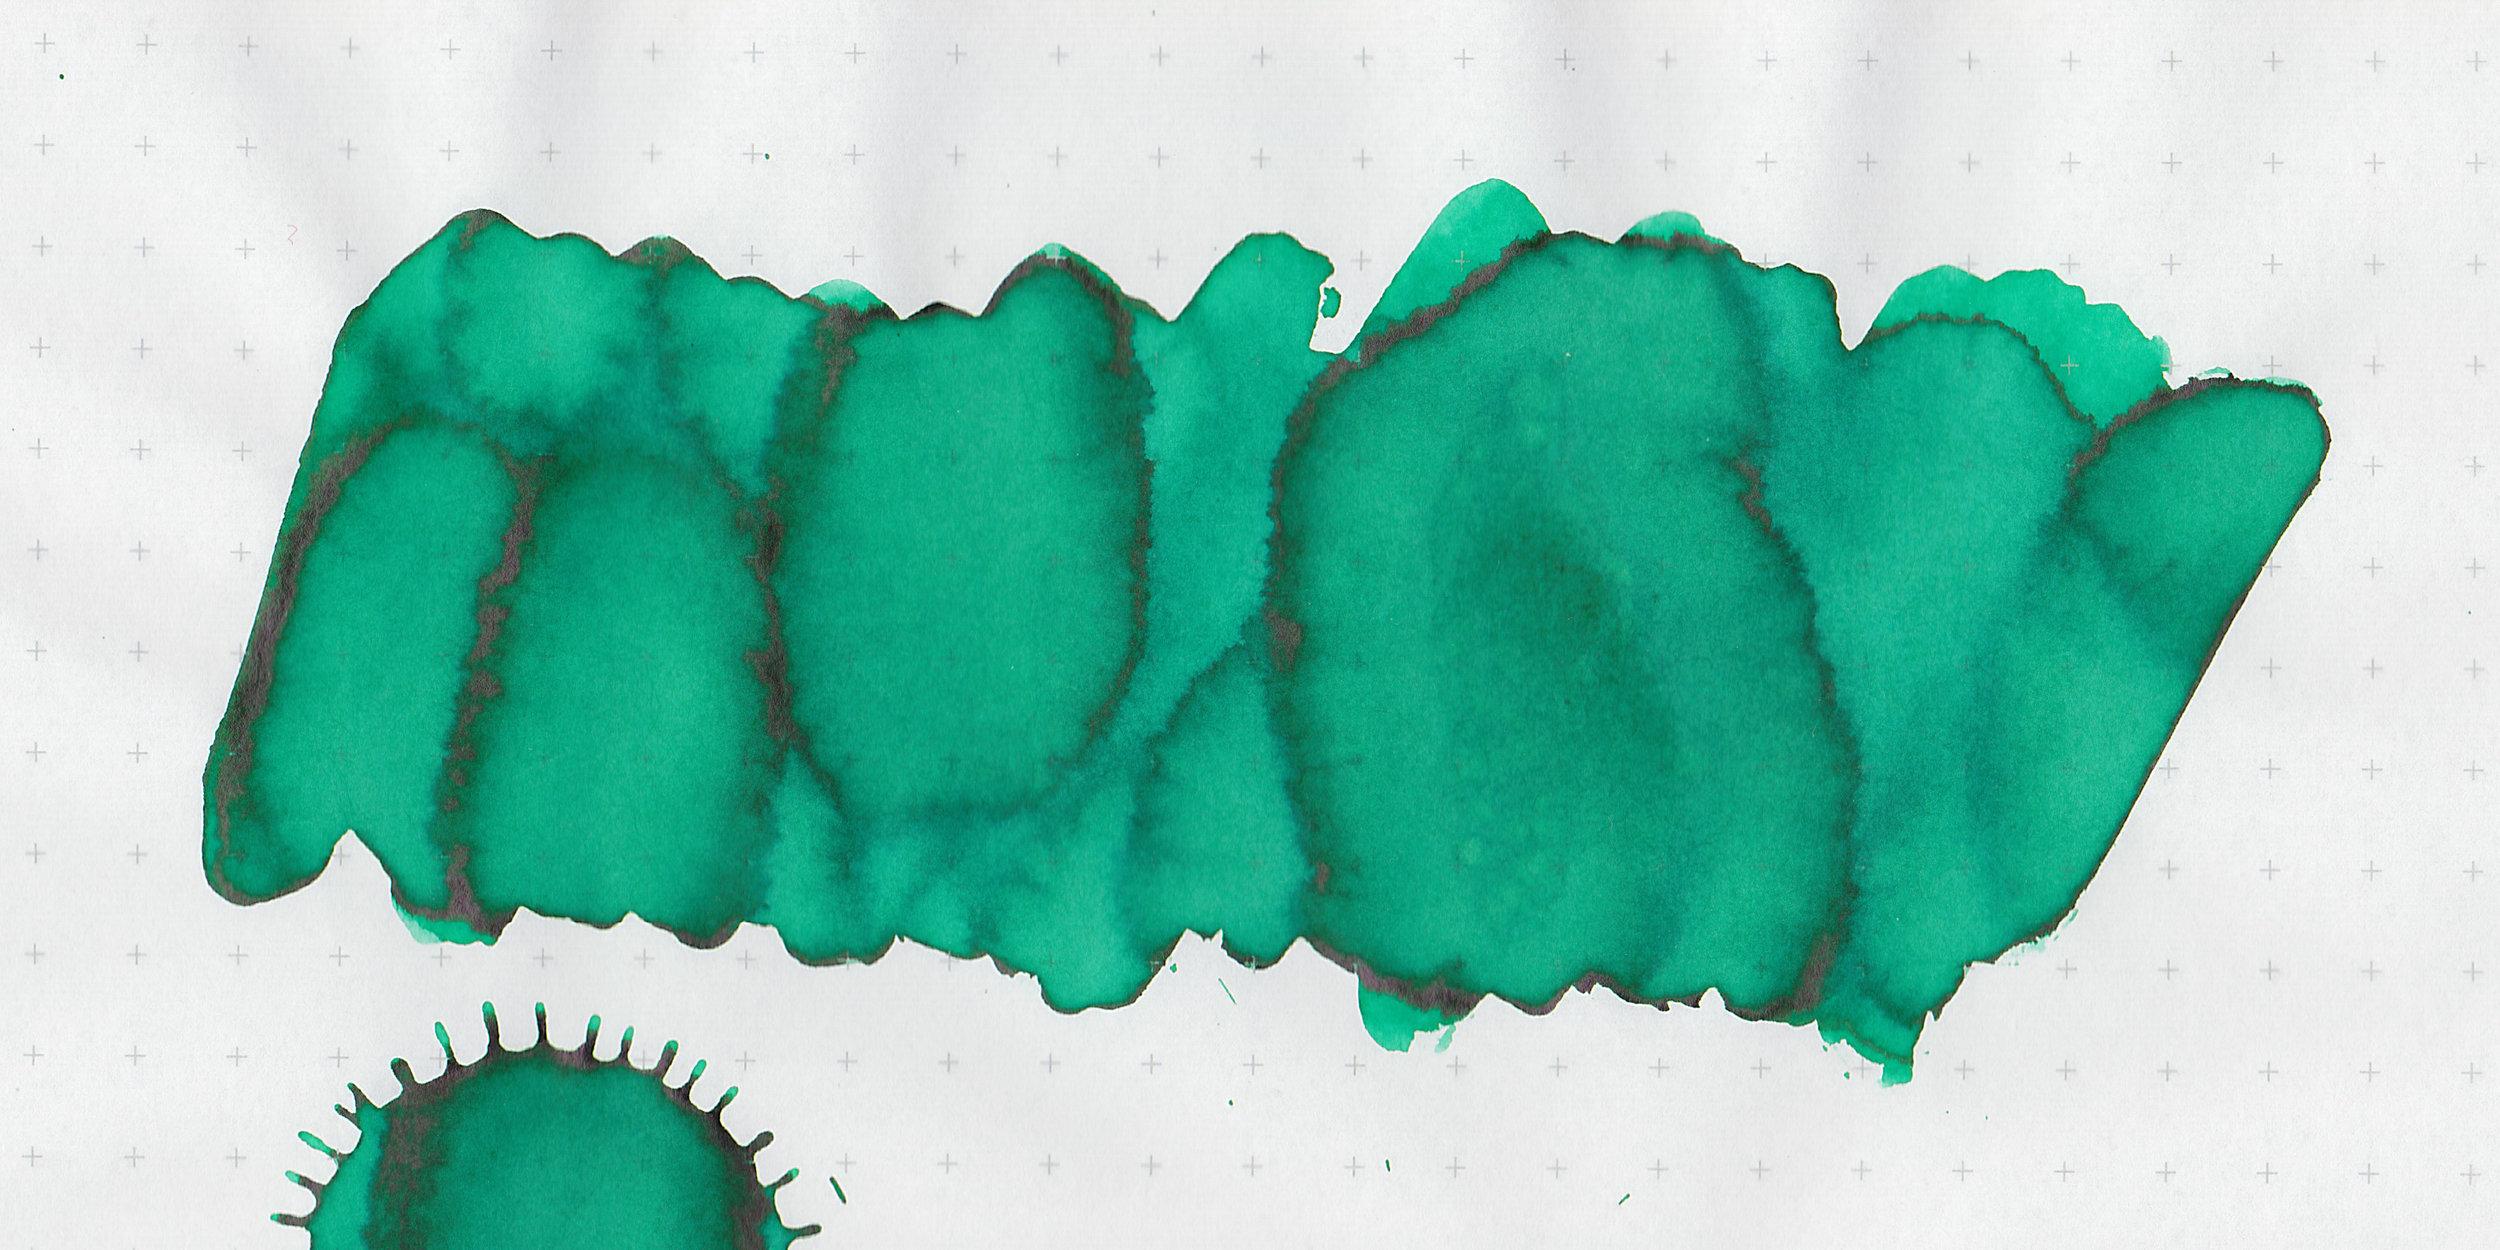 skr-emerald-green-7.jpg